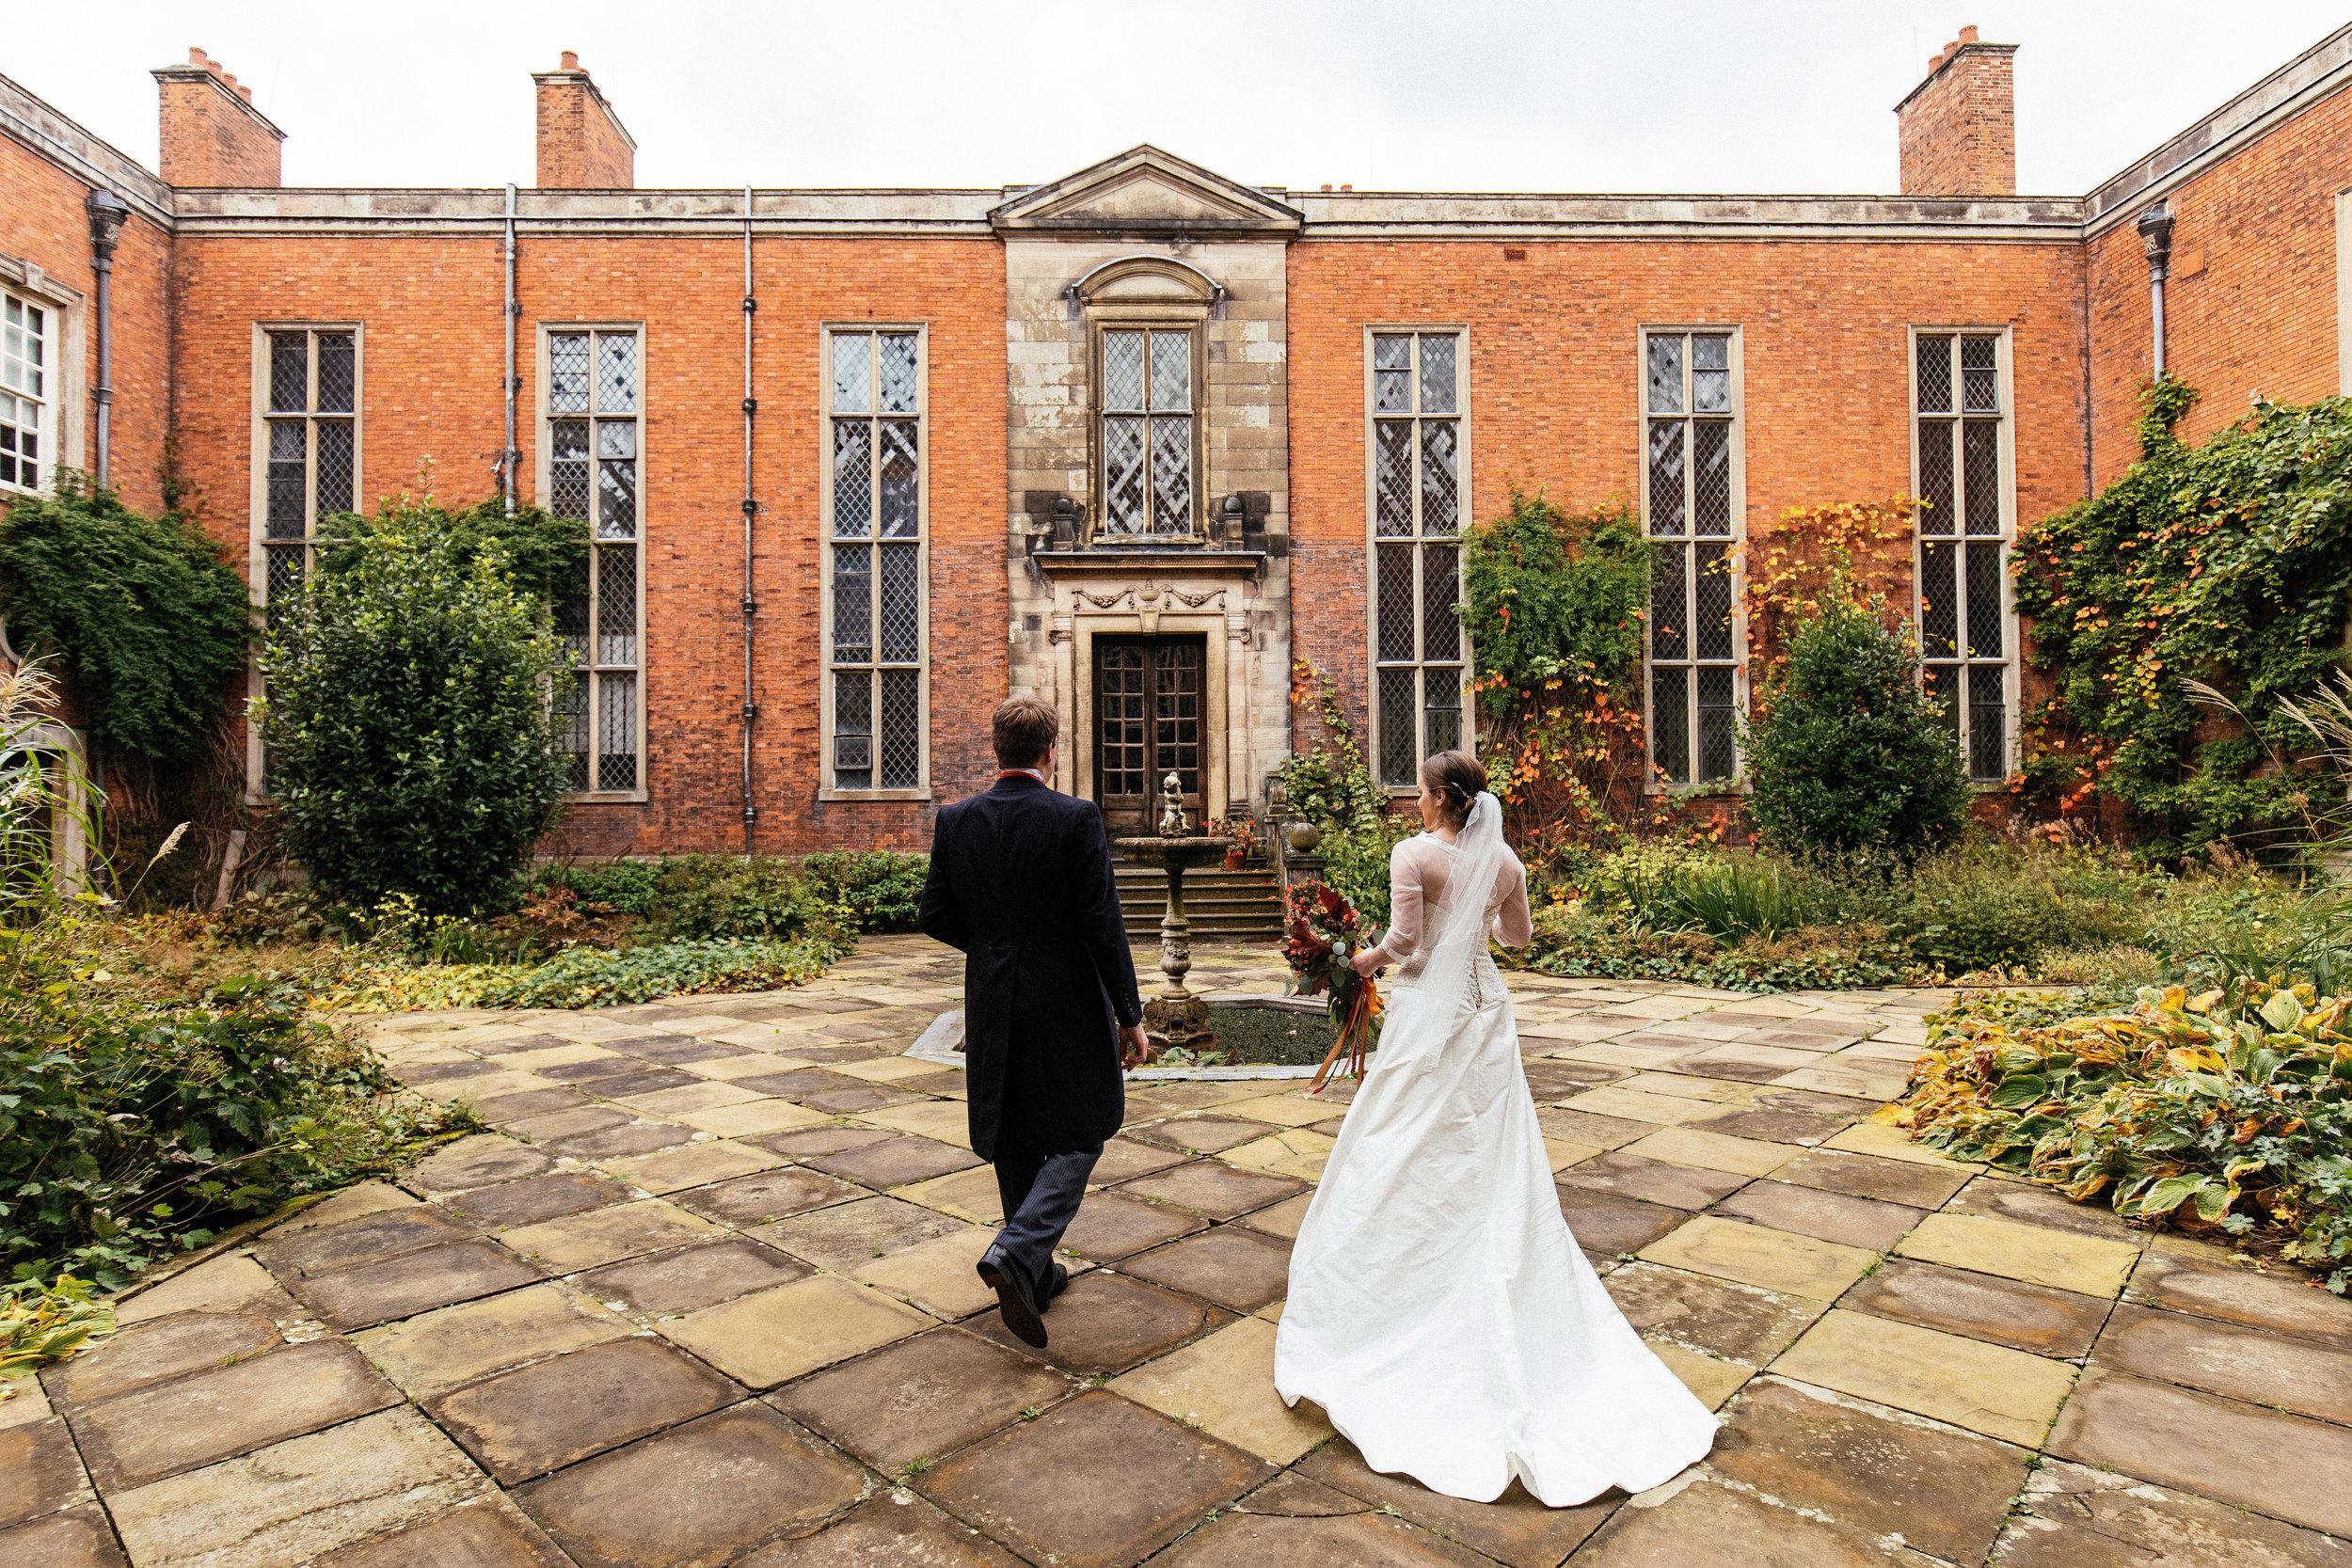 Dunham-Massey-Wedding-Photographer-38.jpg